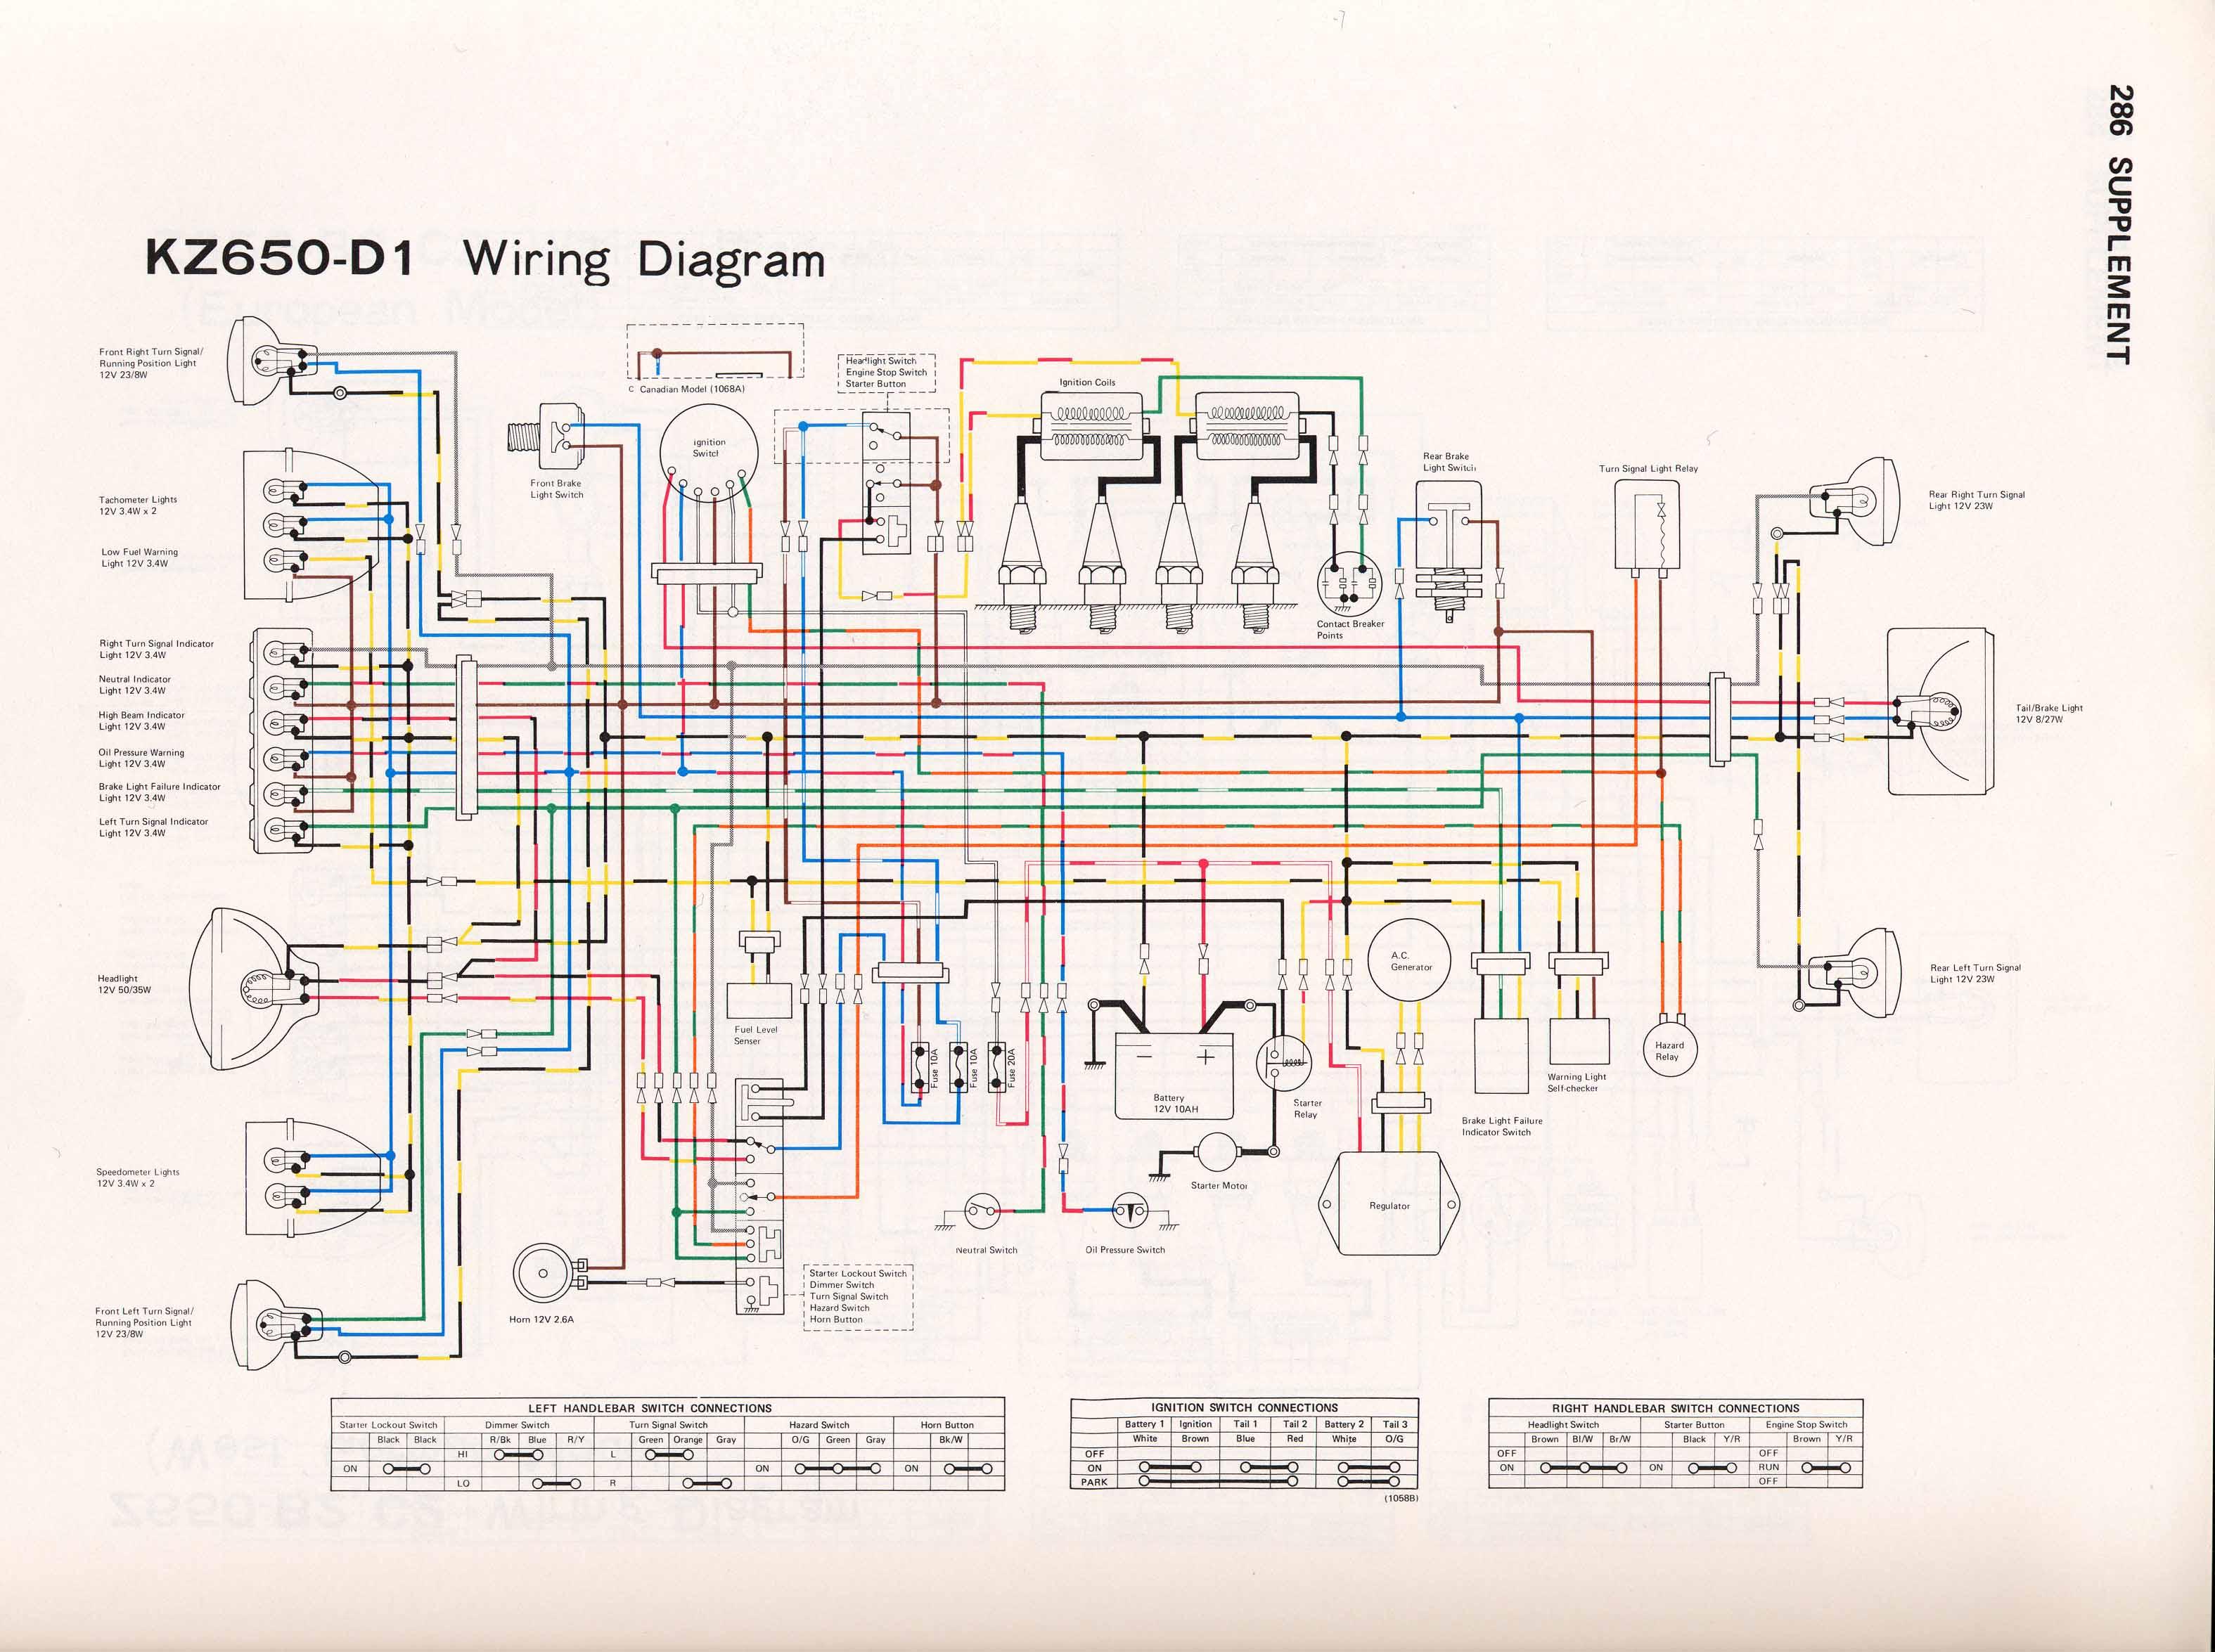 Kawasaki Brute Force 750 Wiring Diagram Kz650 Info Wiring Diagrams